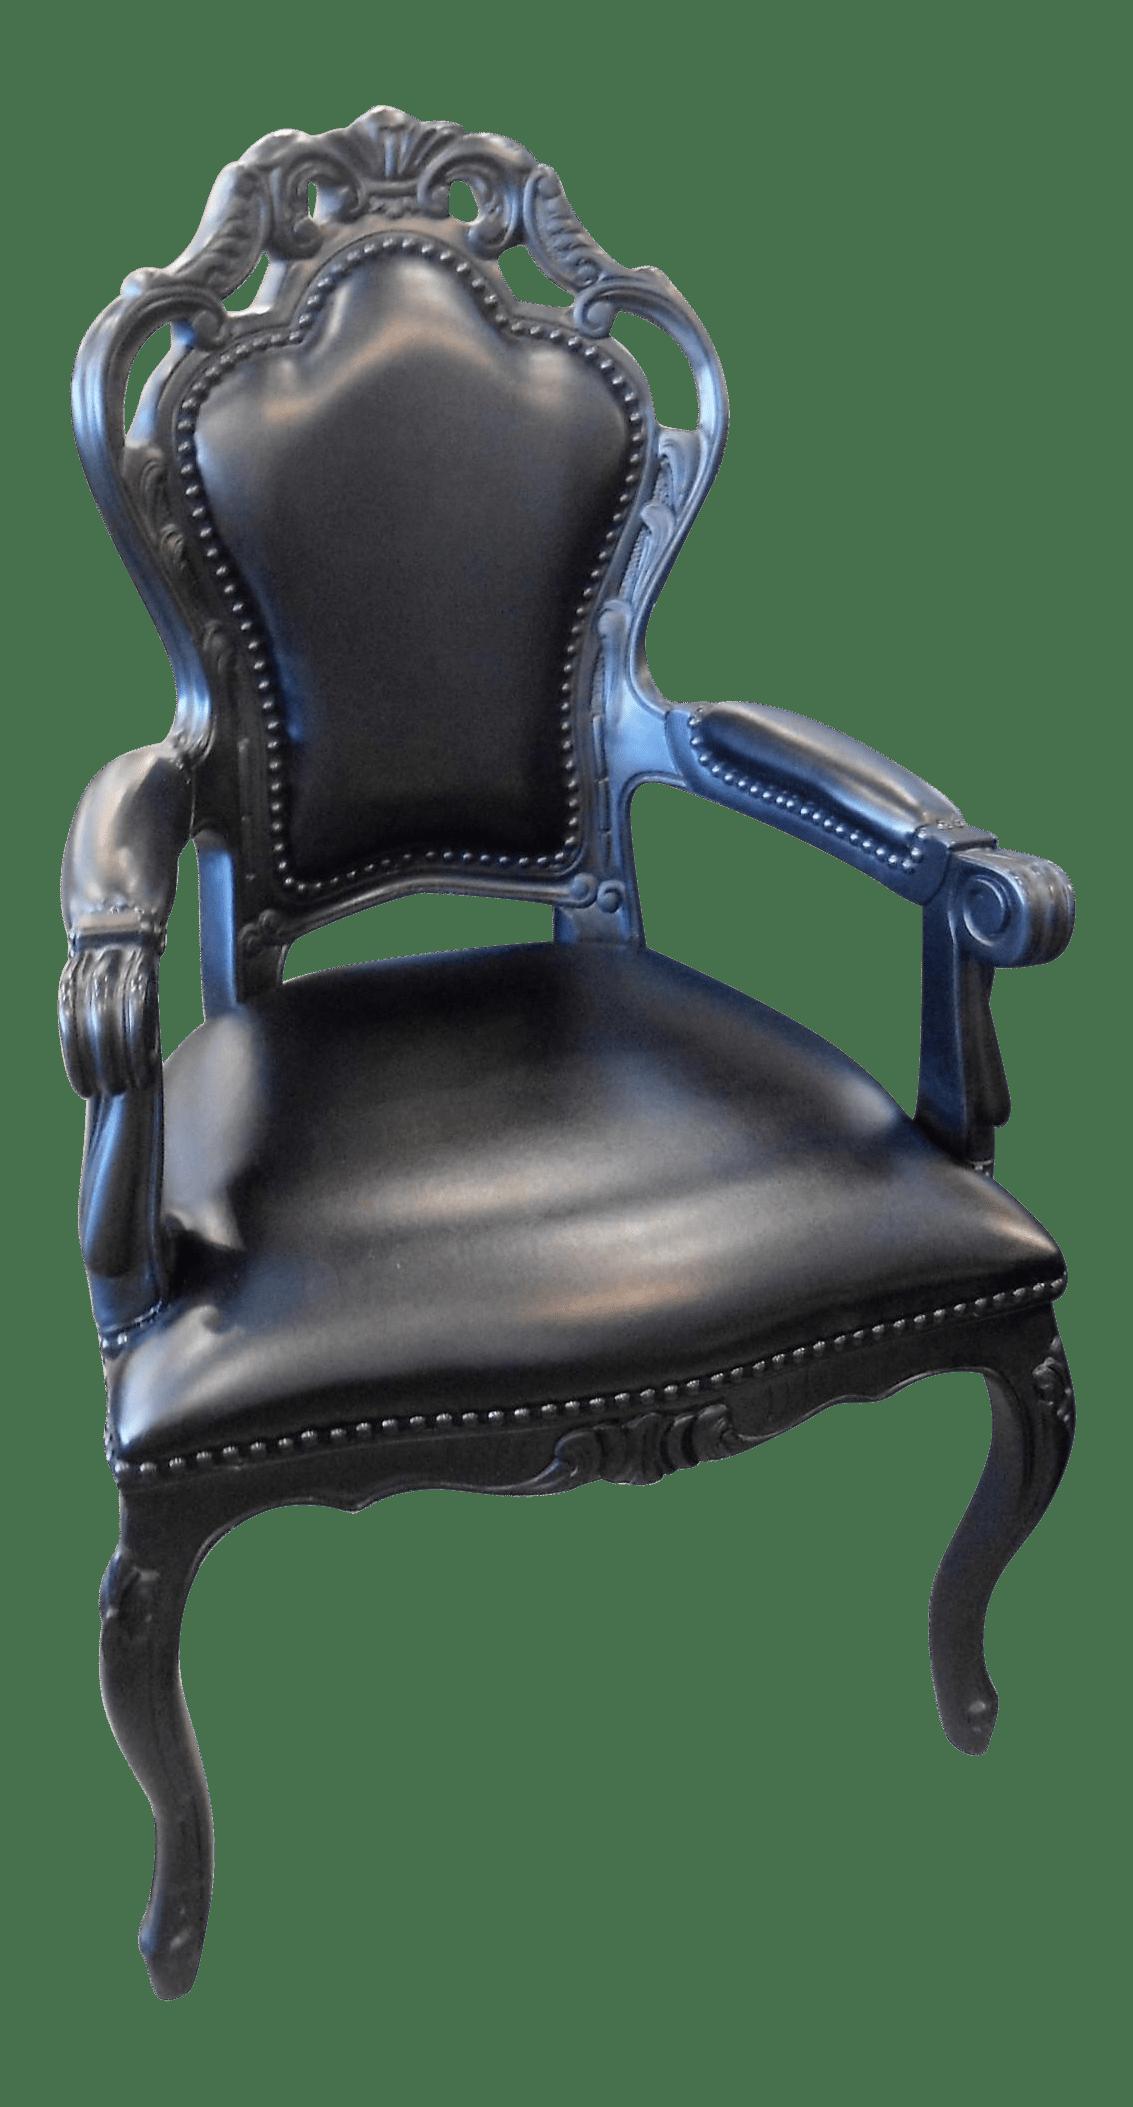 black throne chair stool work polart small armchair chairish